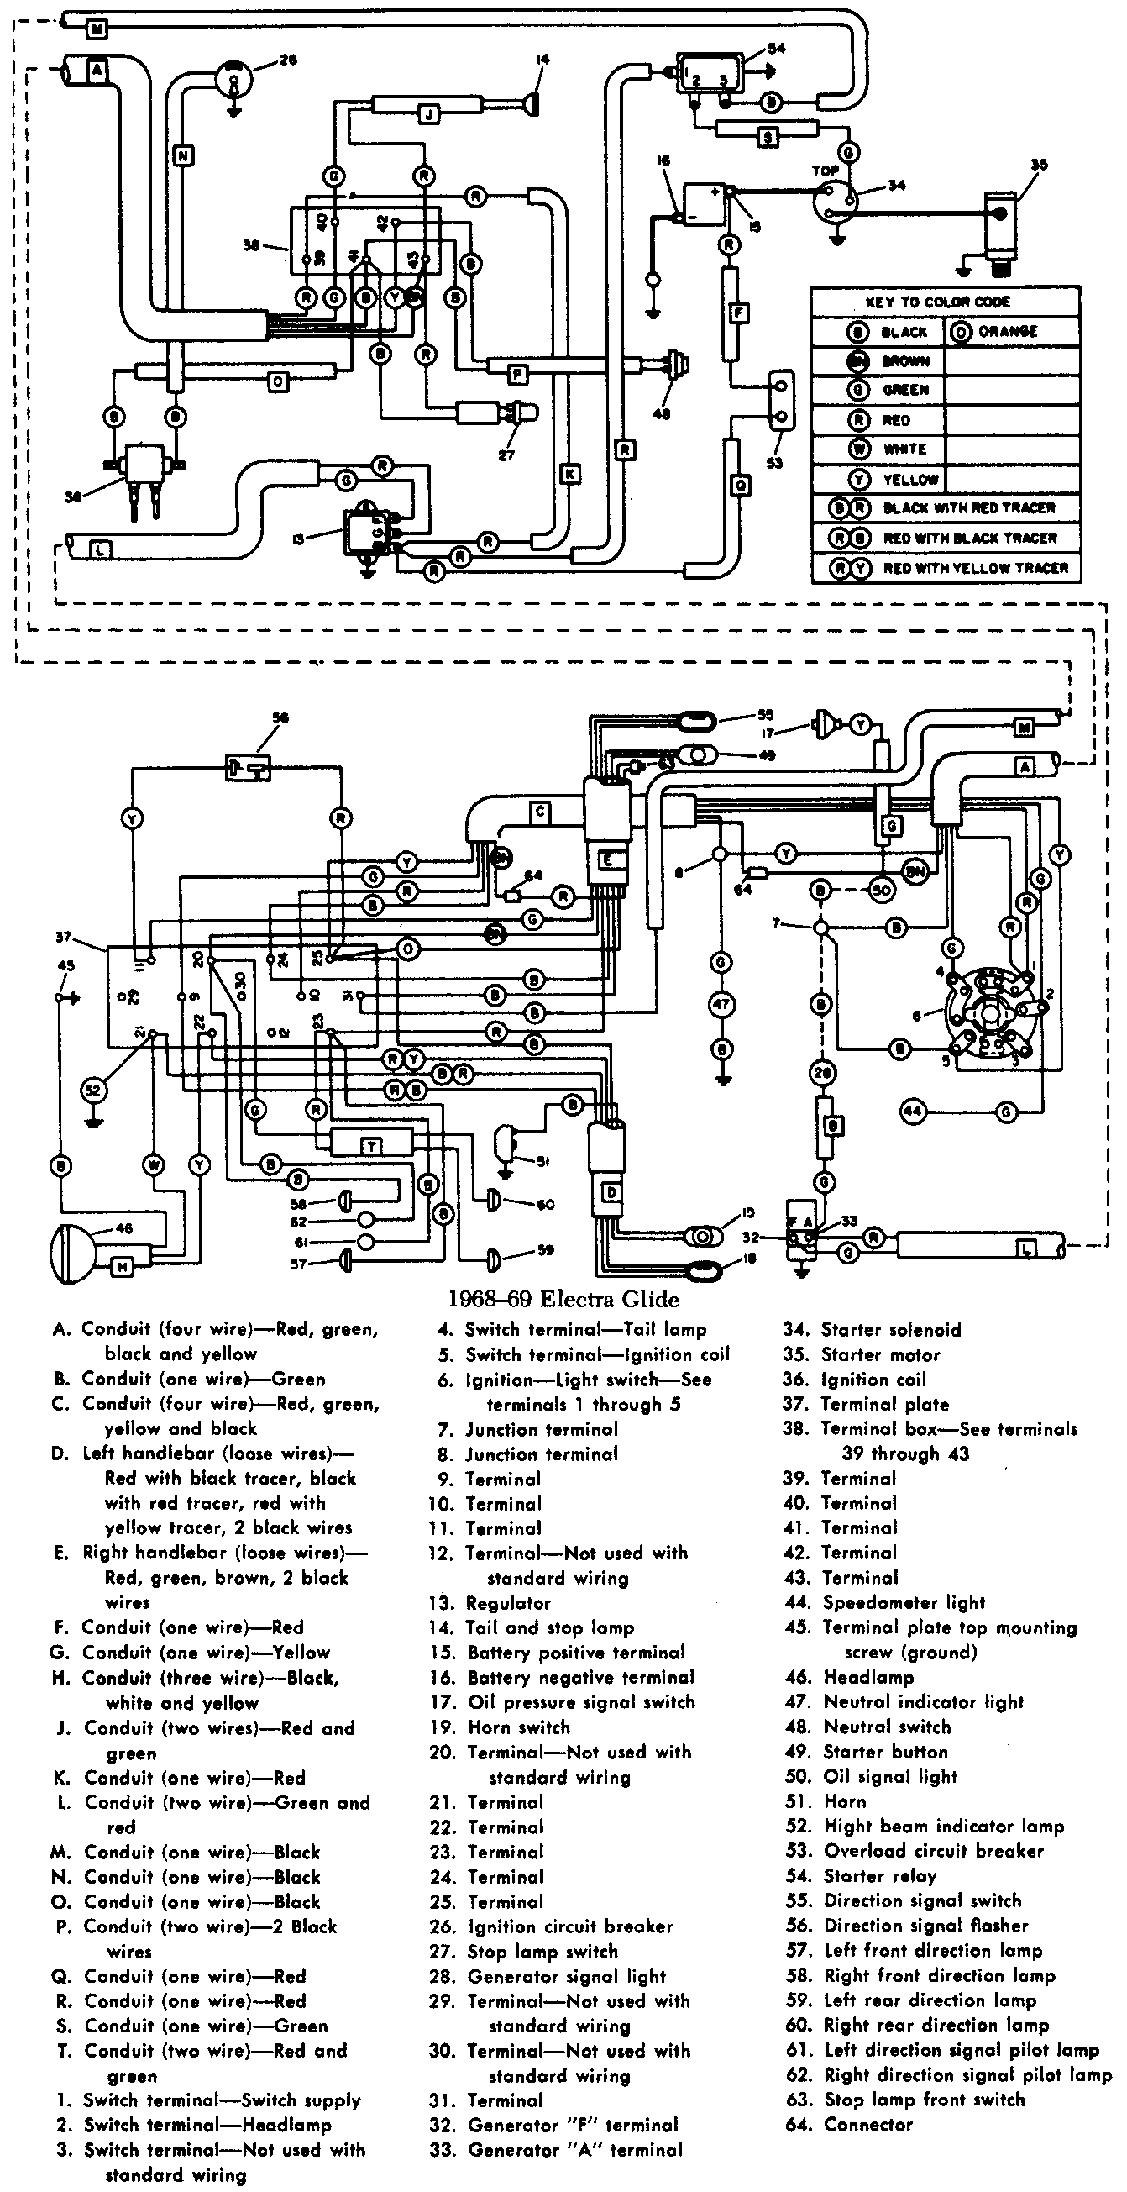 V Twin Engine Diagram Fresh Harley Davidson Ignition Switch Wiring Diagram Diagram Of V Twin Engine Diagram